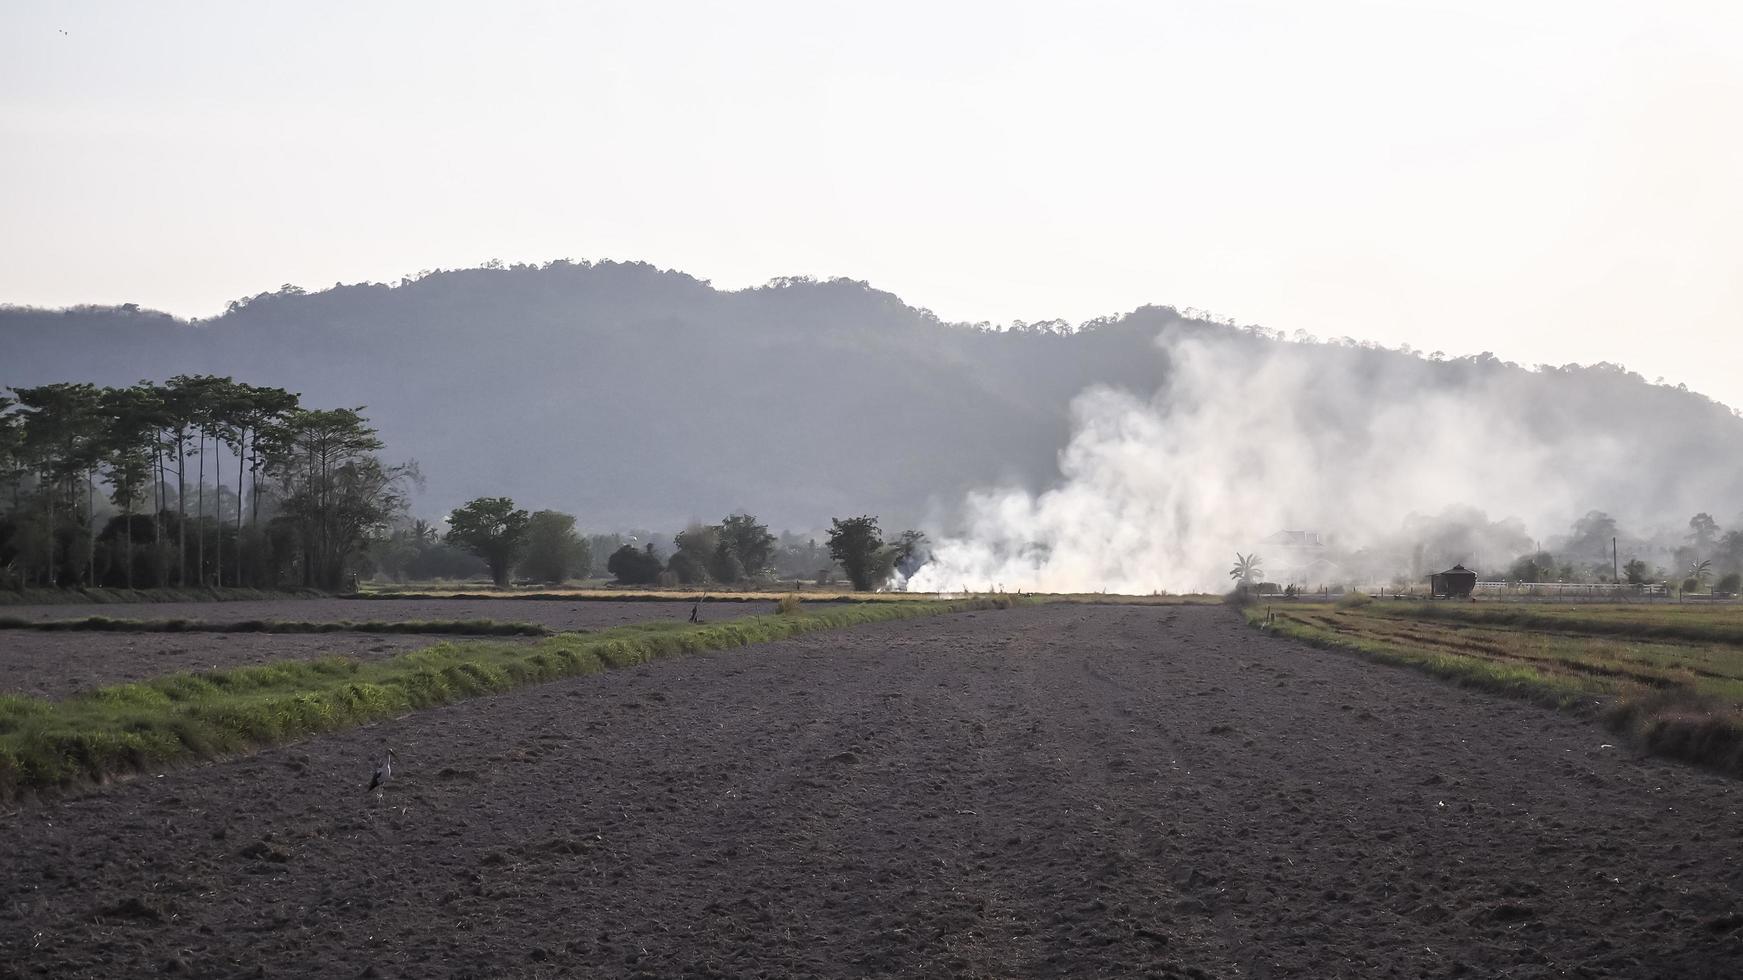 Smoke on a rural farm field in Thailand photo